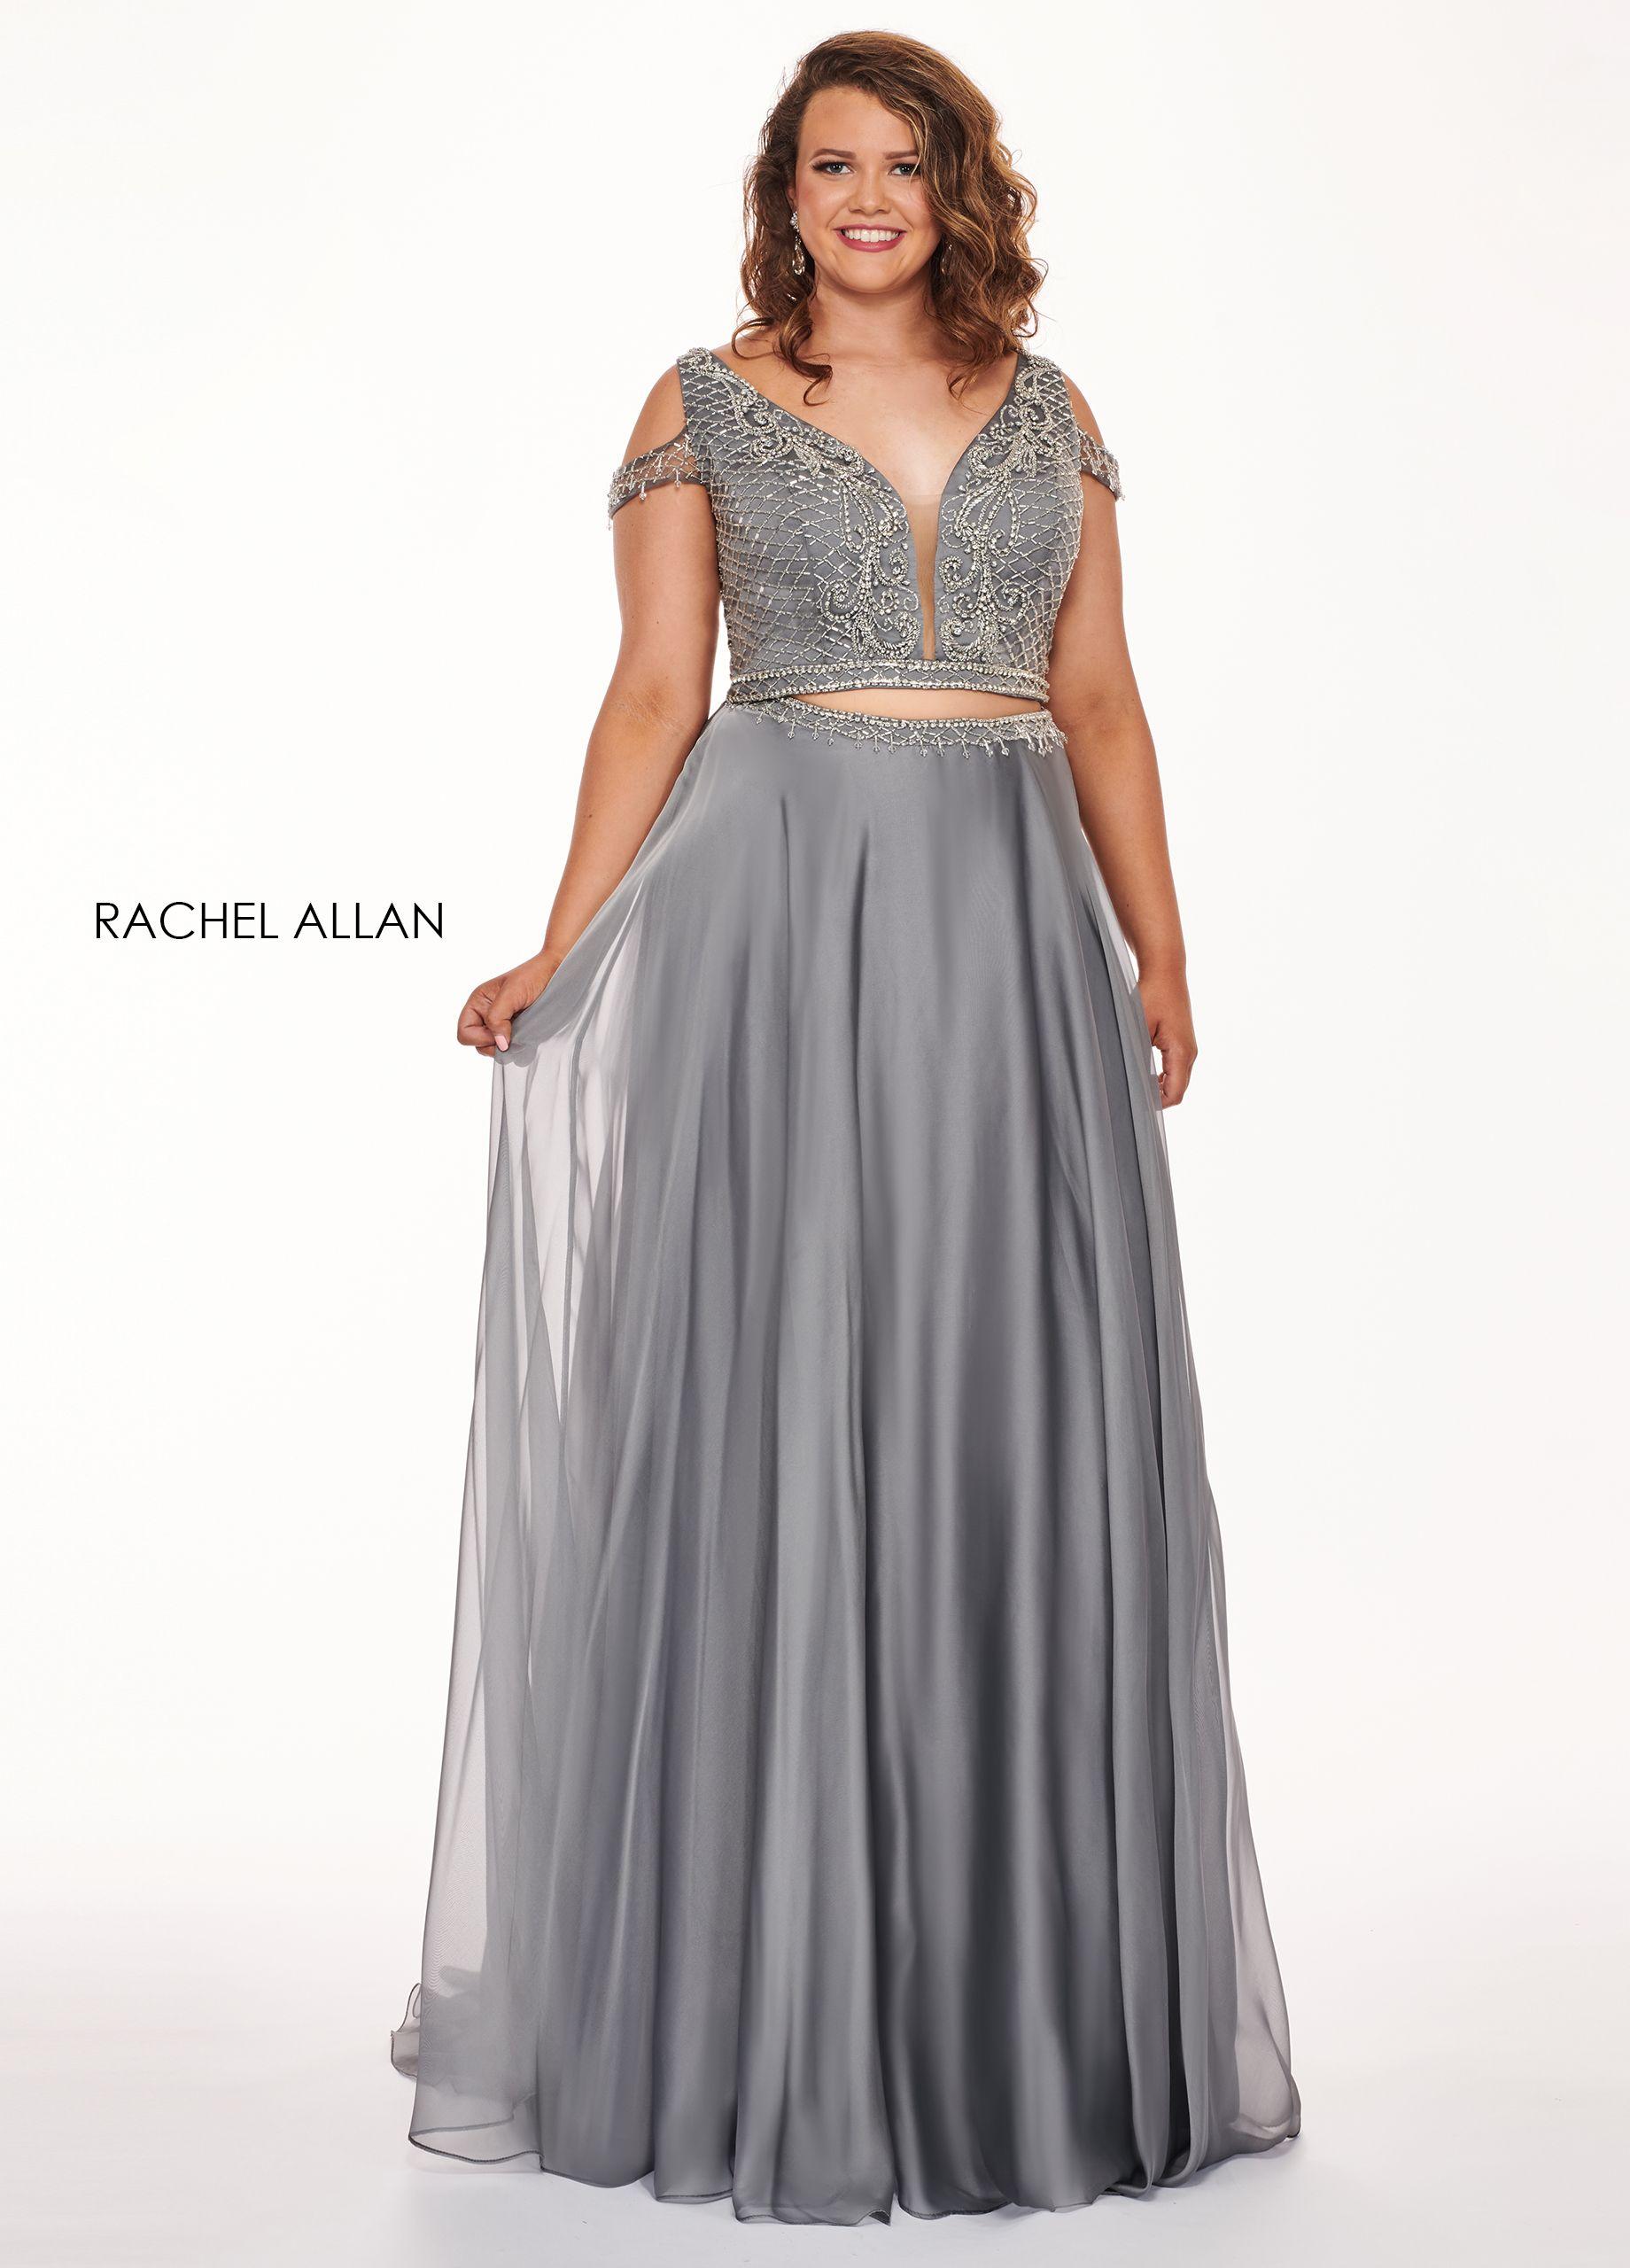 Prom dress 2019 | Curve dresses, Plus size homecoming